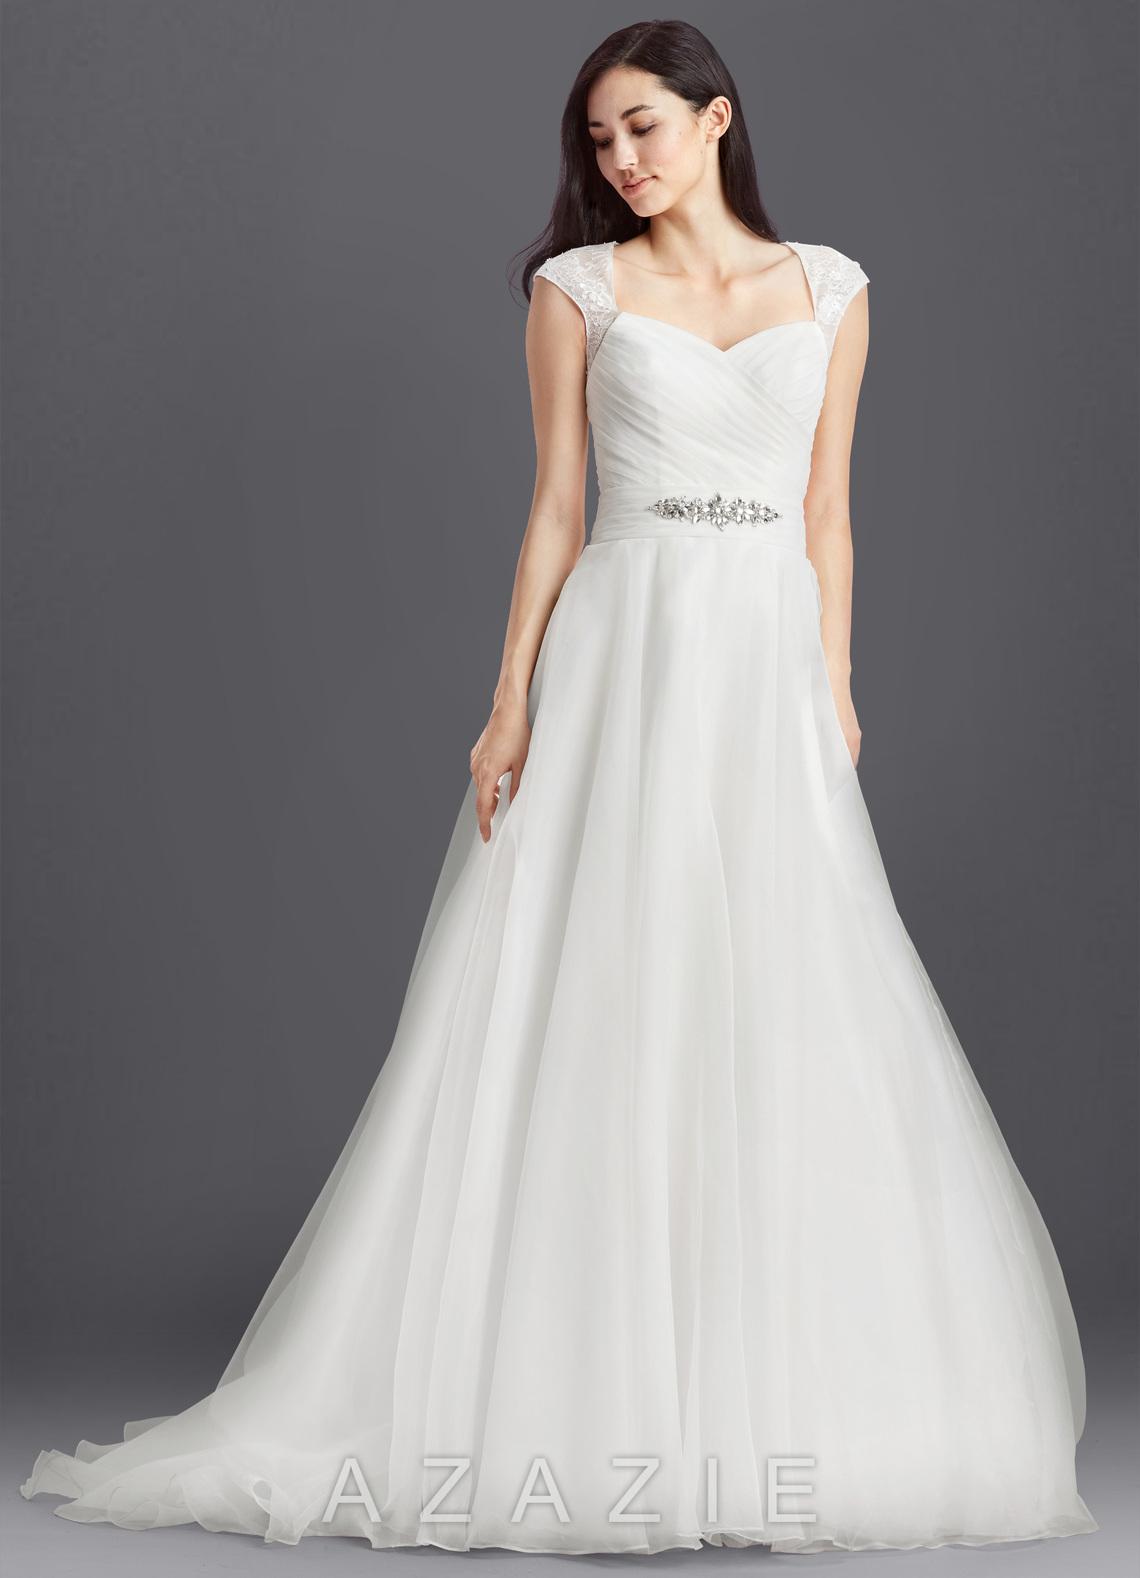 Azazie Farrah BG Wedding Dresses 8408ec0d8